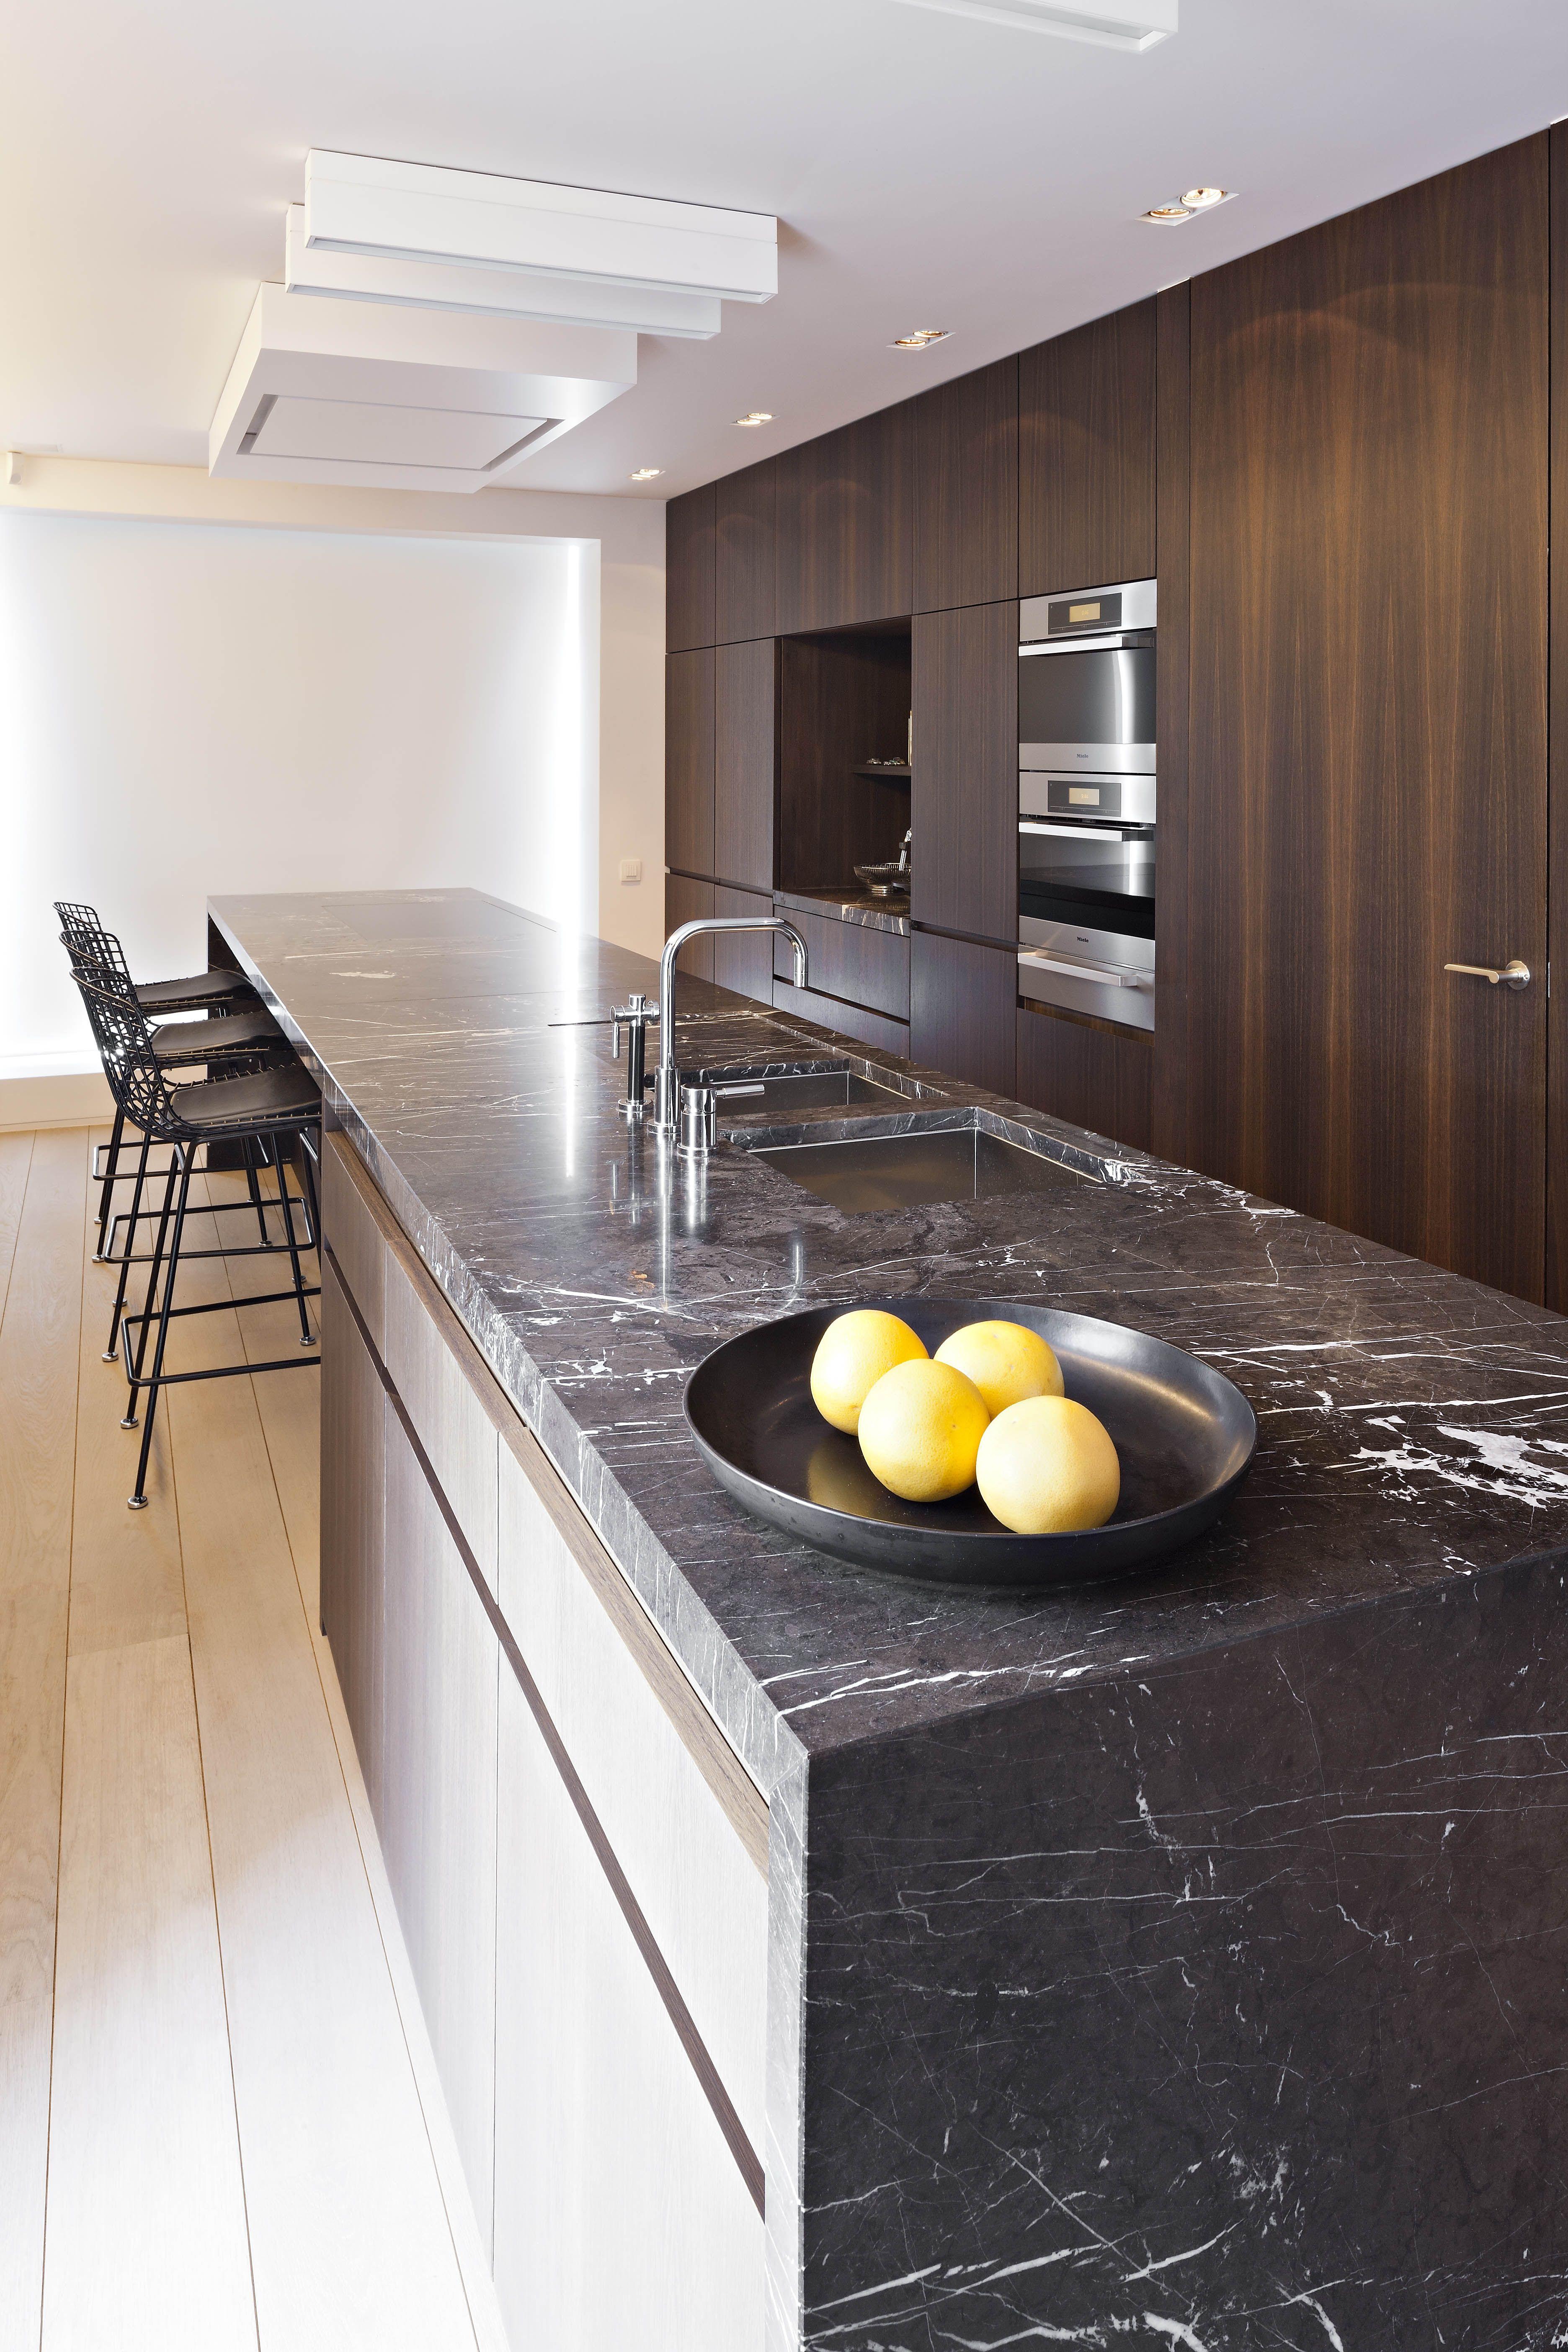 Realisations Natural Stone Hullebusch Kuche Loft Wohnung Kuche Kuchen Design